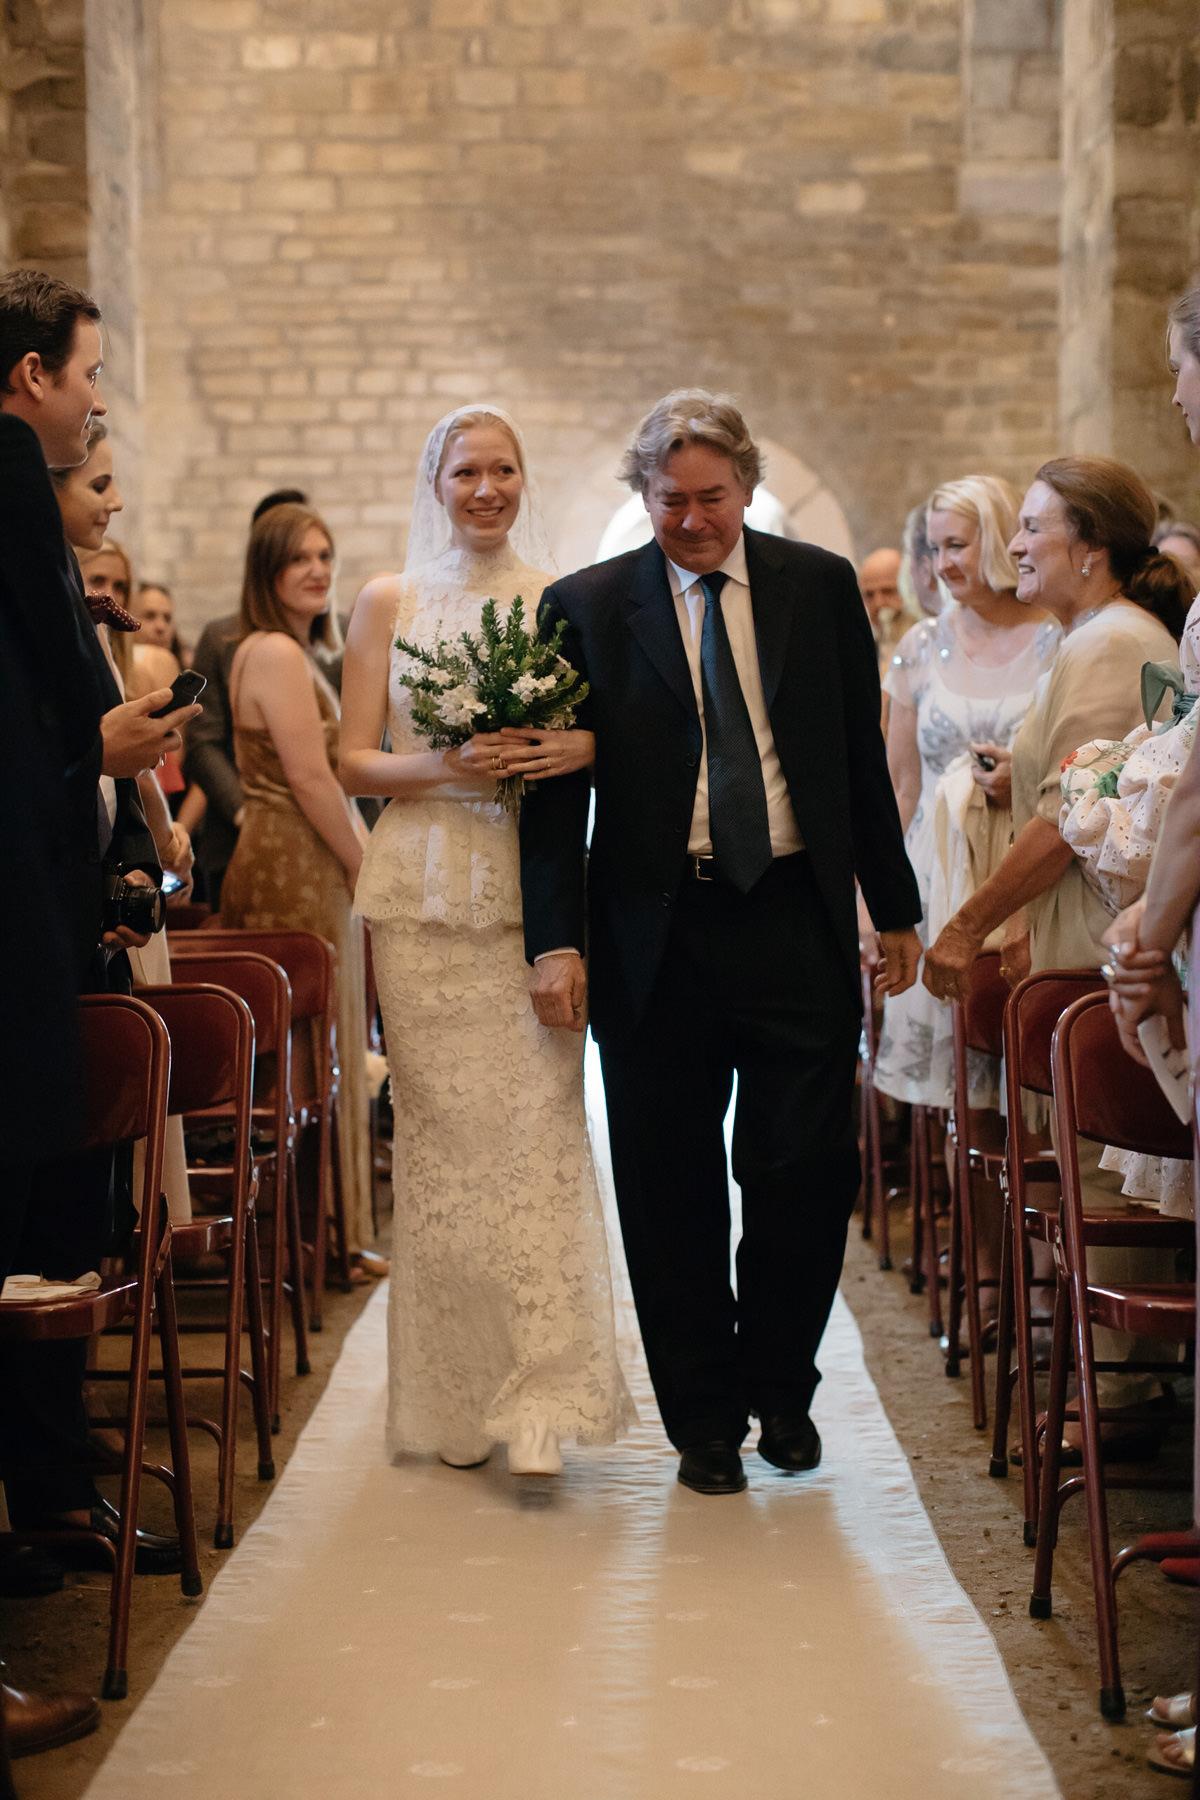 151-lifestories-photography-wedding-Frances-Jonah-2017-_MG_2722